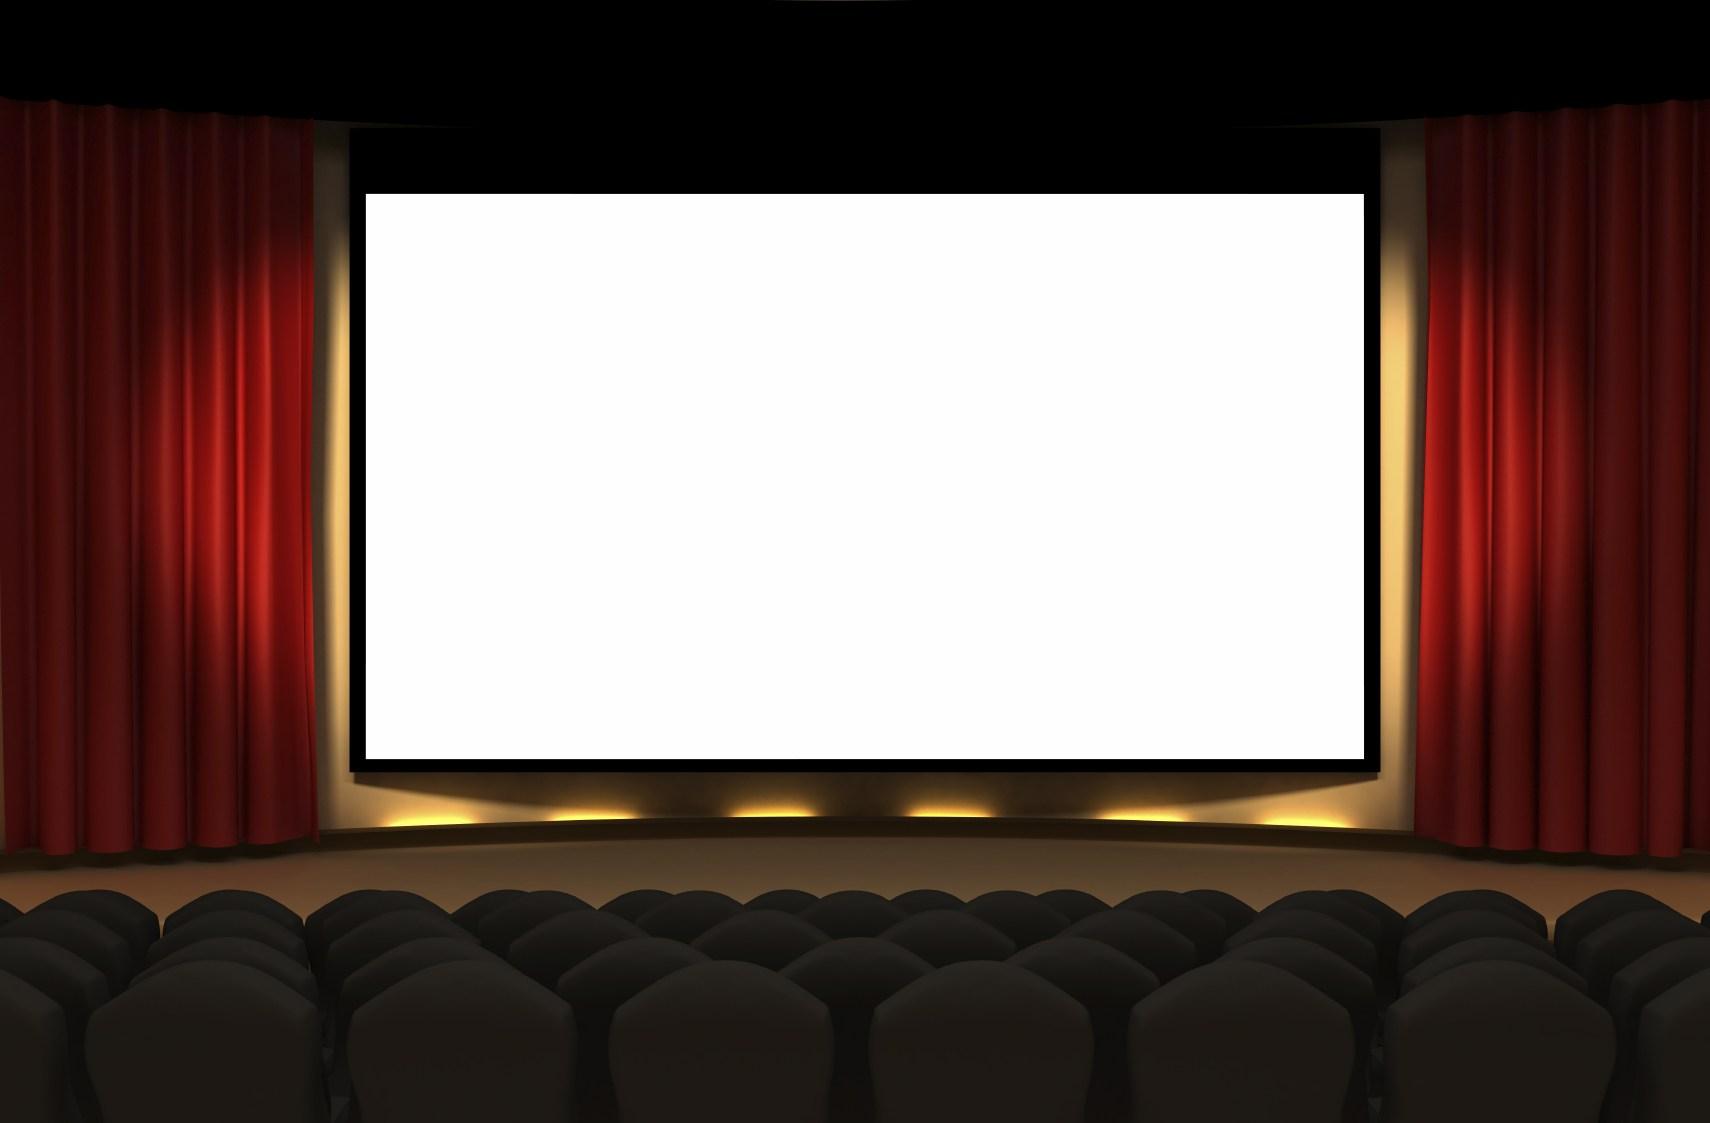 Movie screen clipart 7 » Clipart Portal.